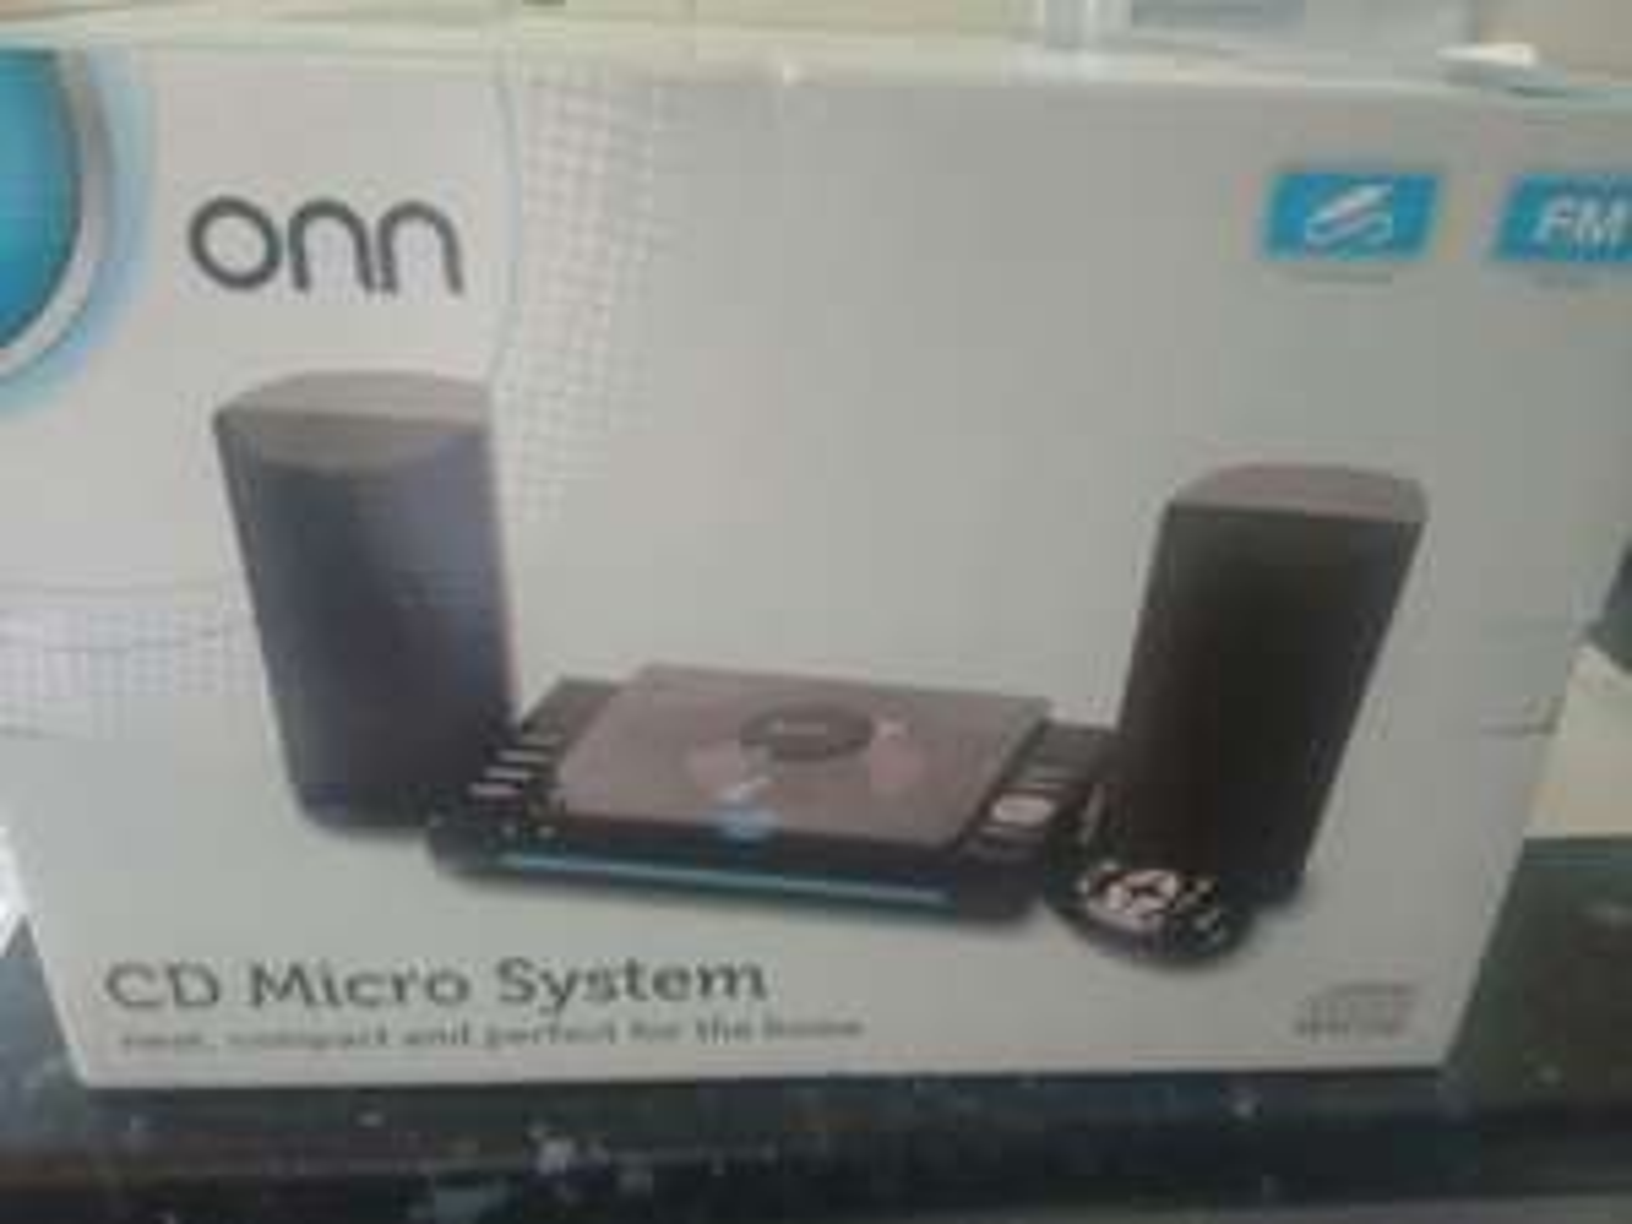 Onn cd micro system £12 at Asda instore (Weymouth)